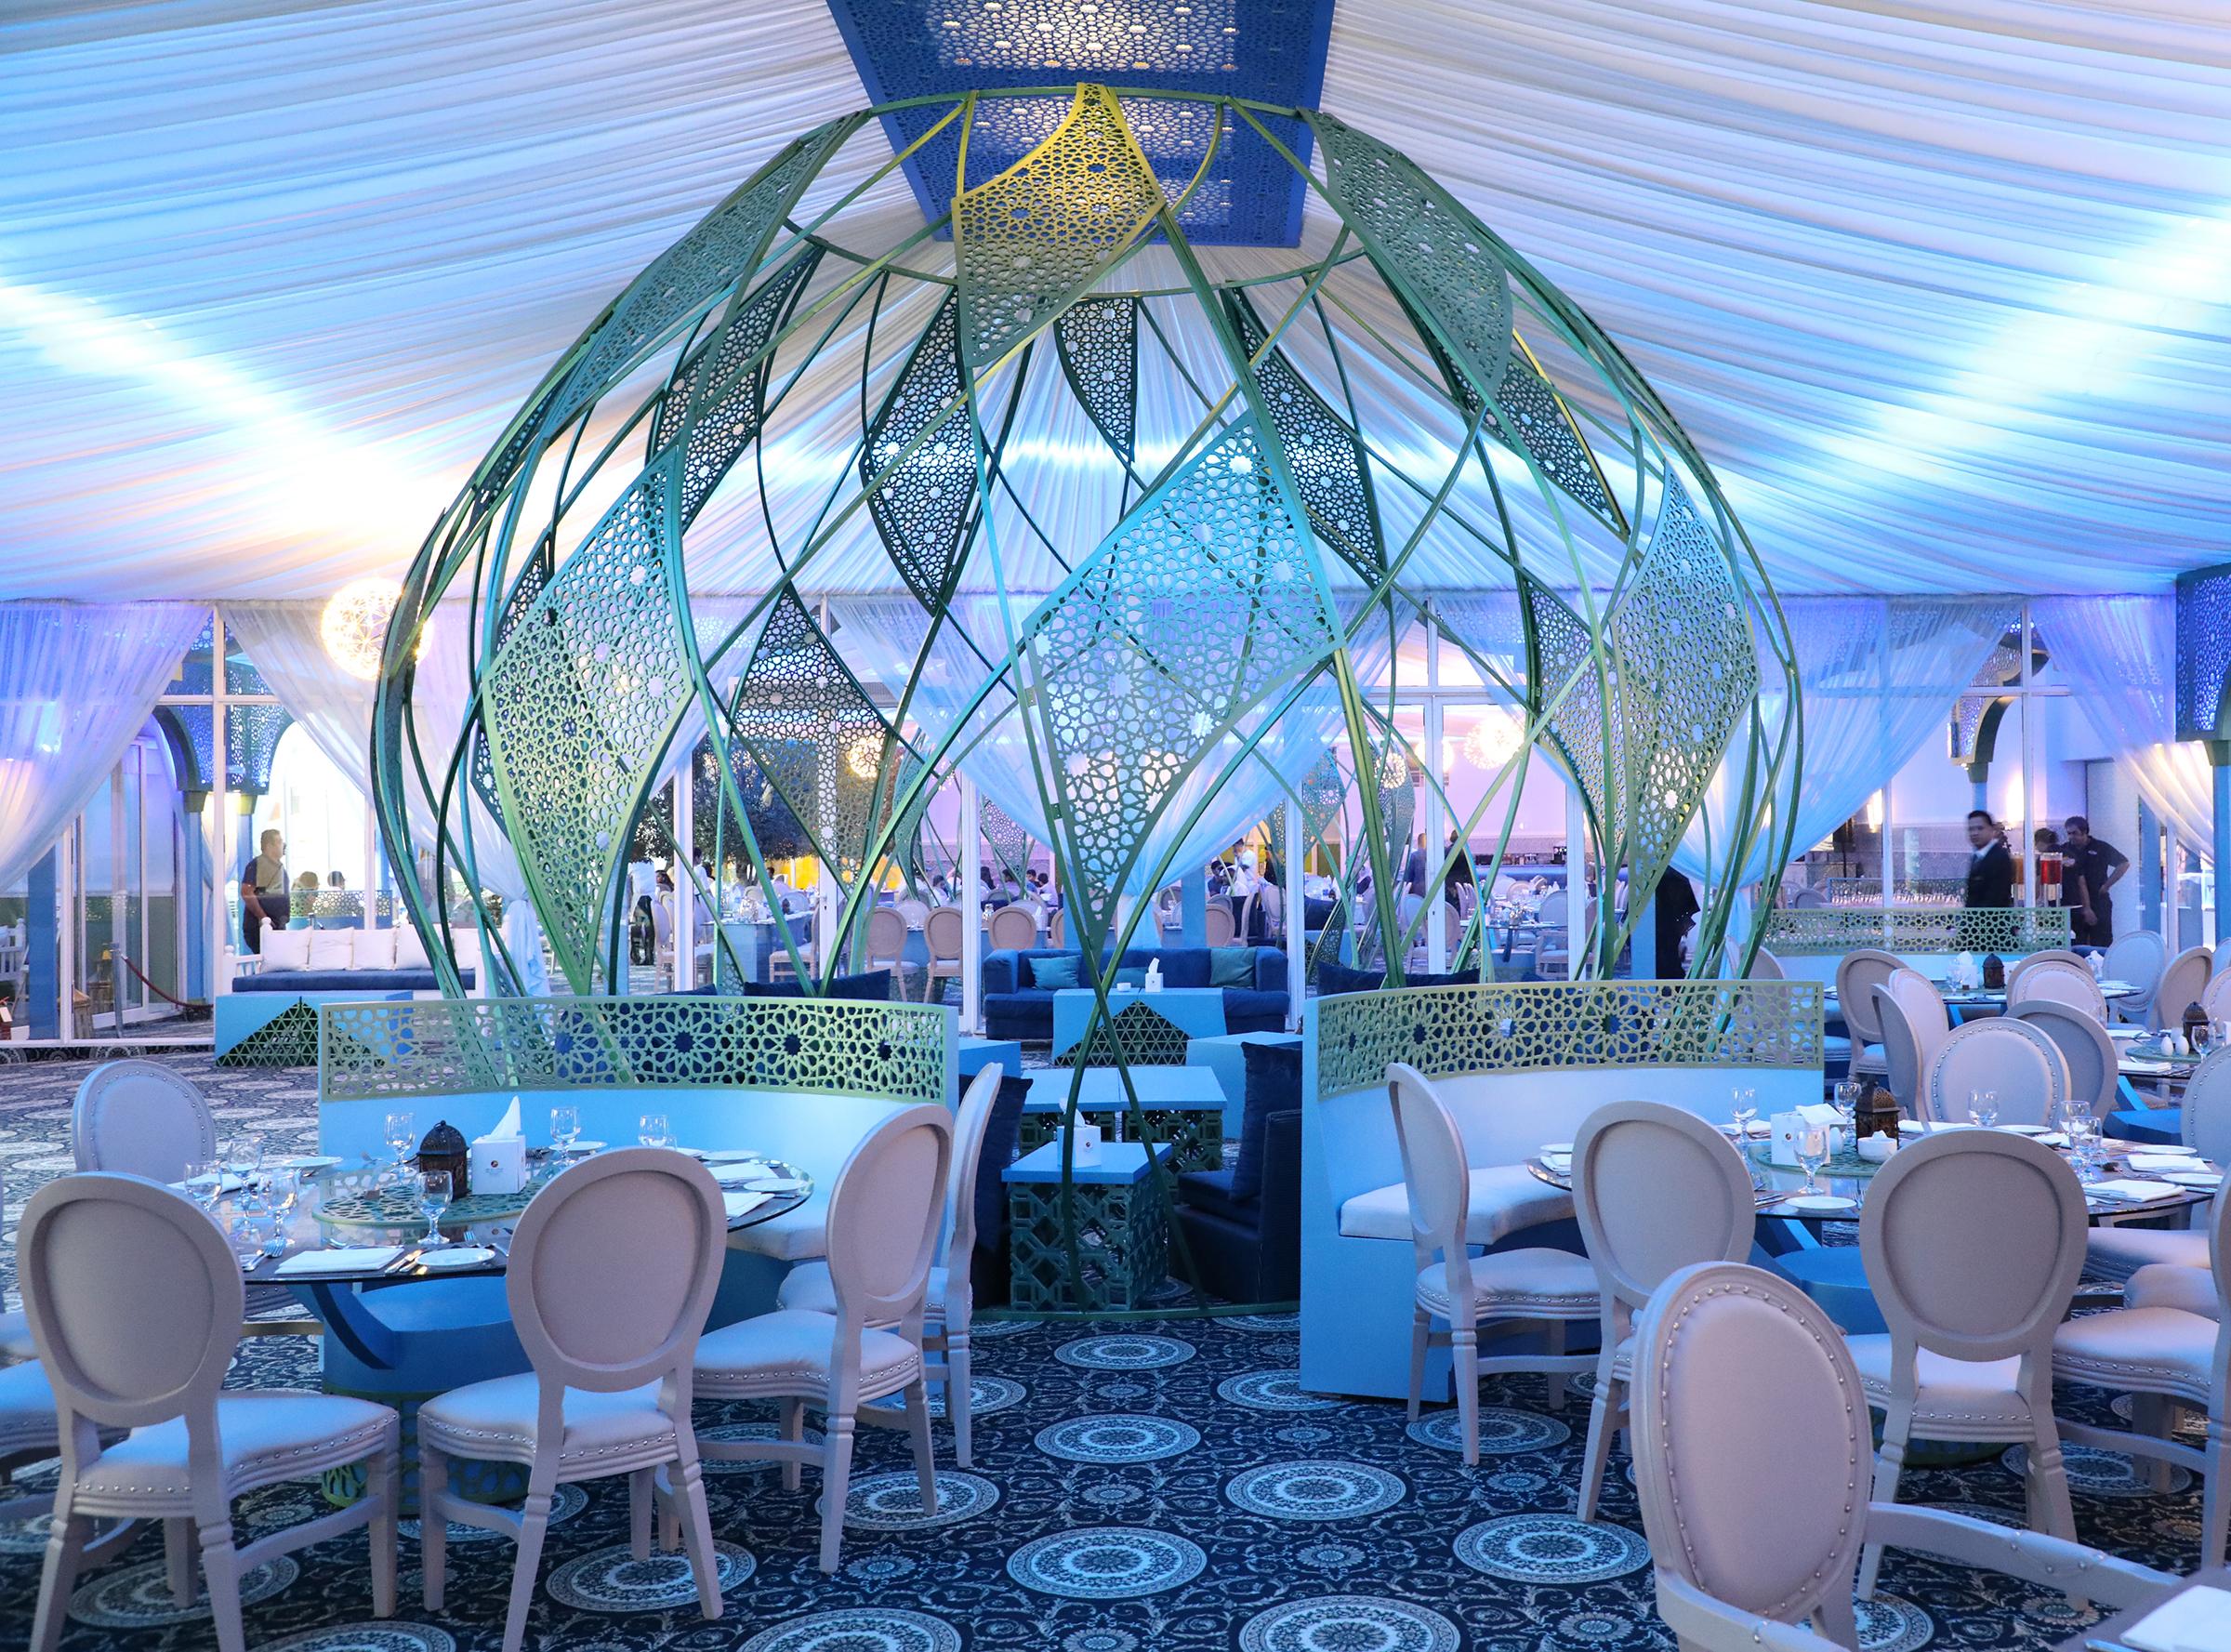 Iftar at Khaimat Al Khaleej